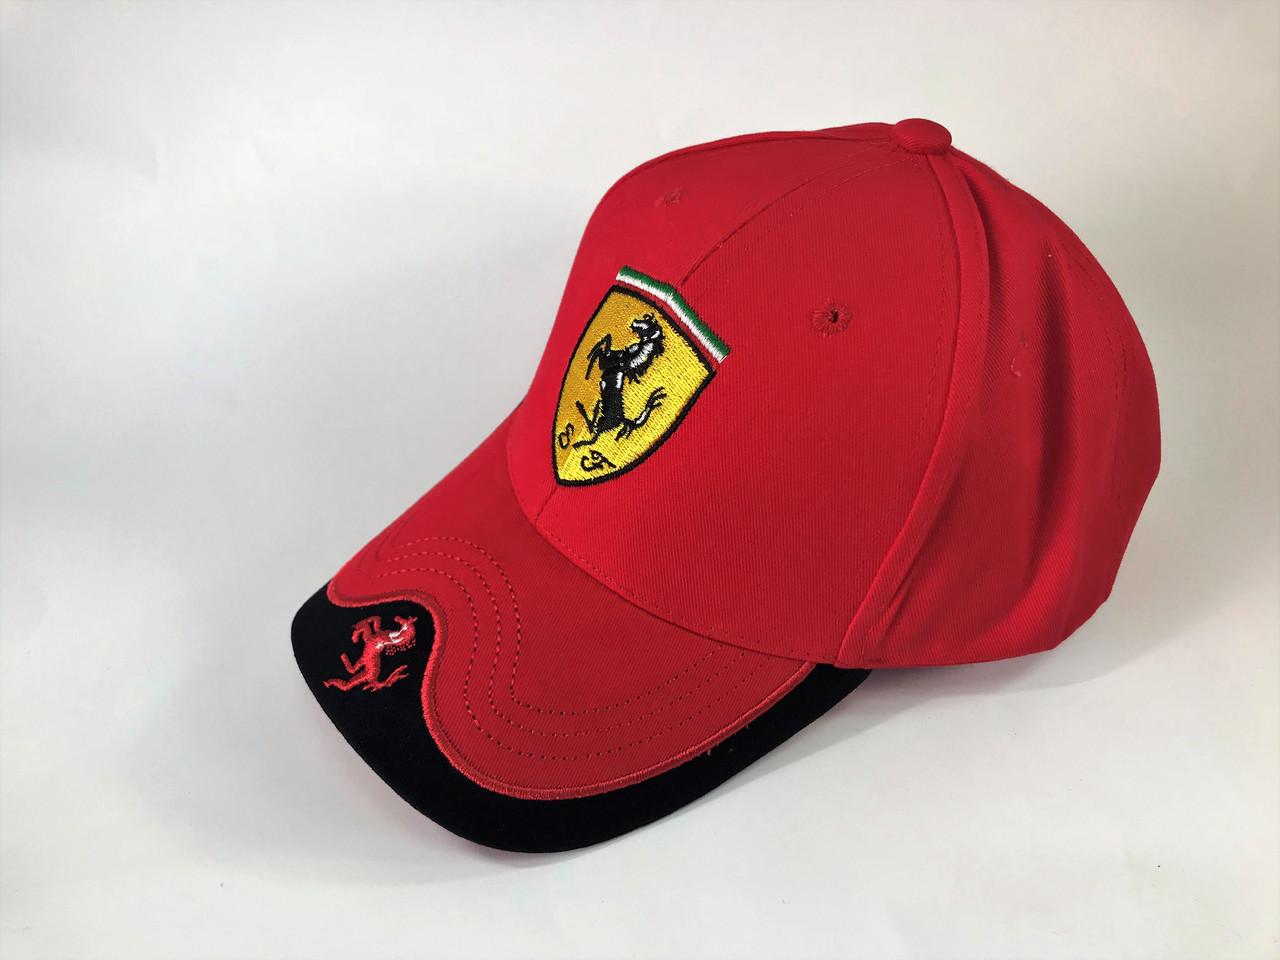 Бейсболка в стиле Ferrari красная